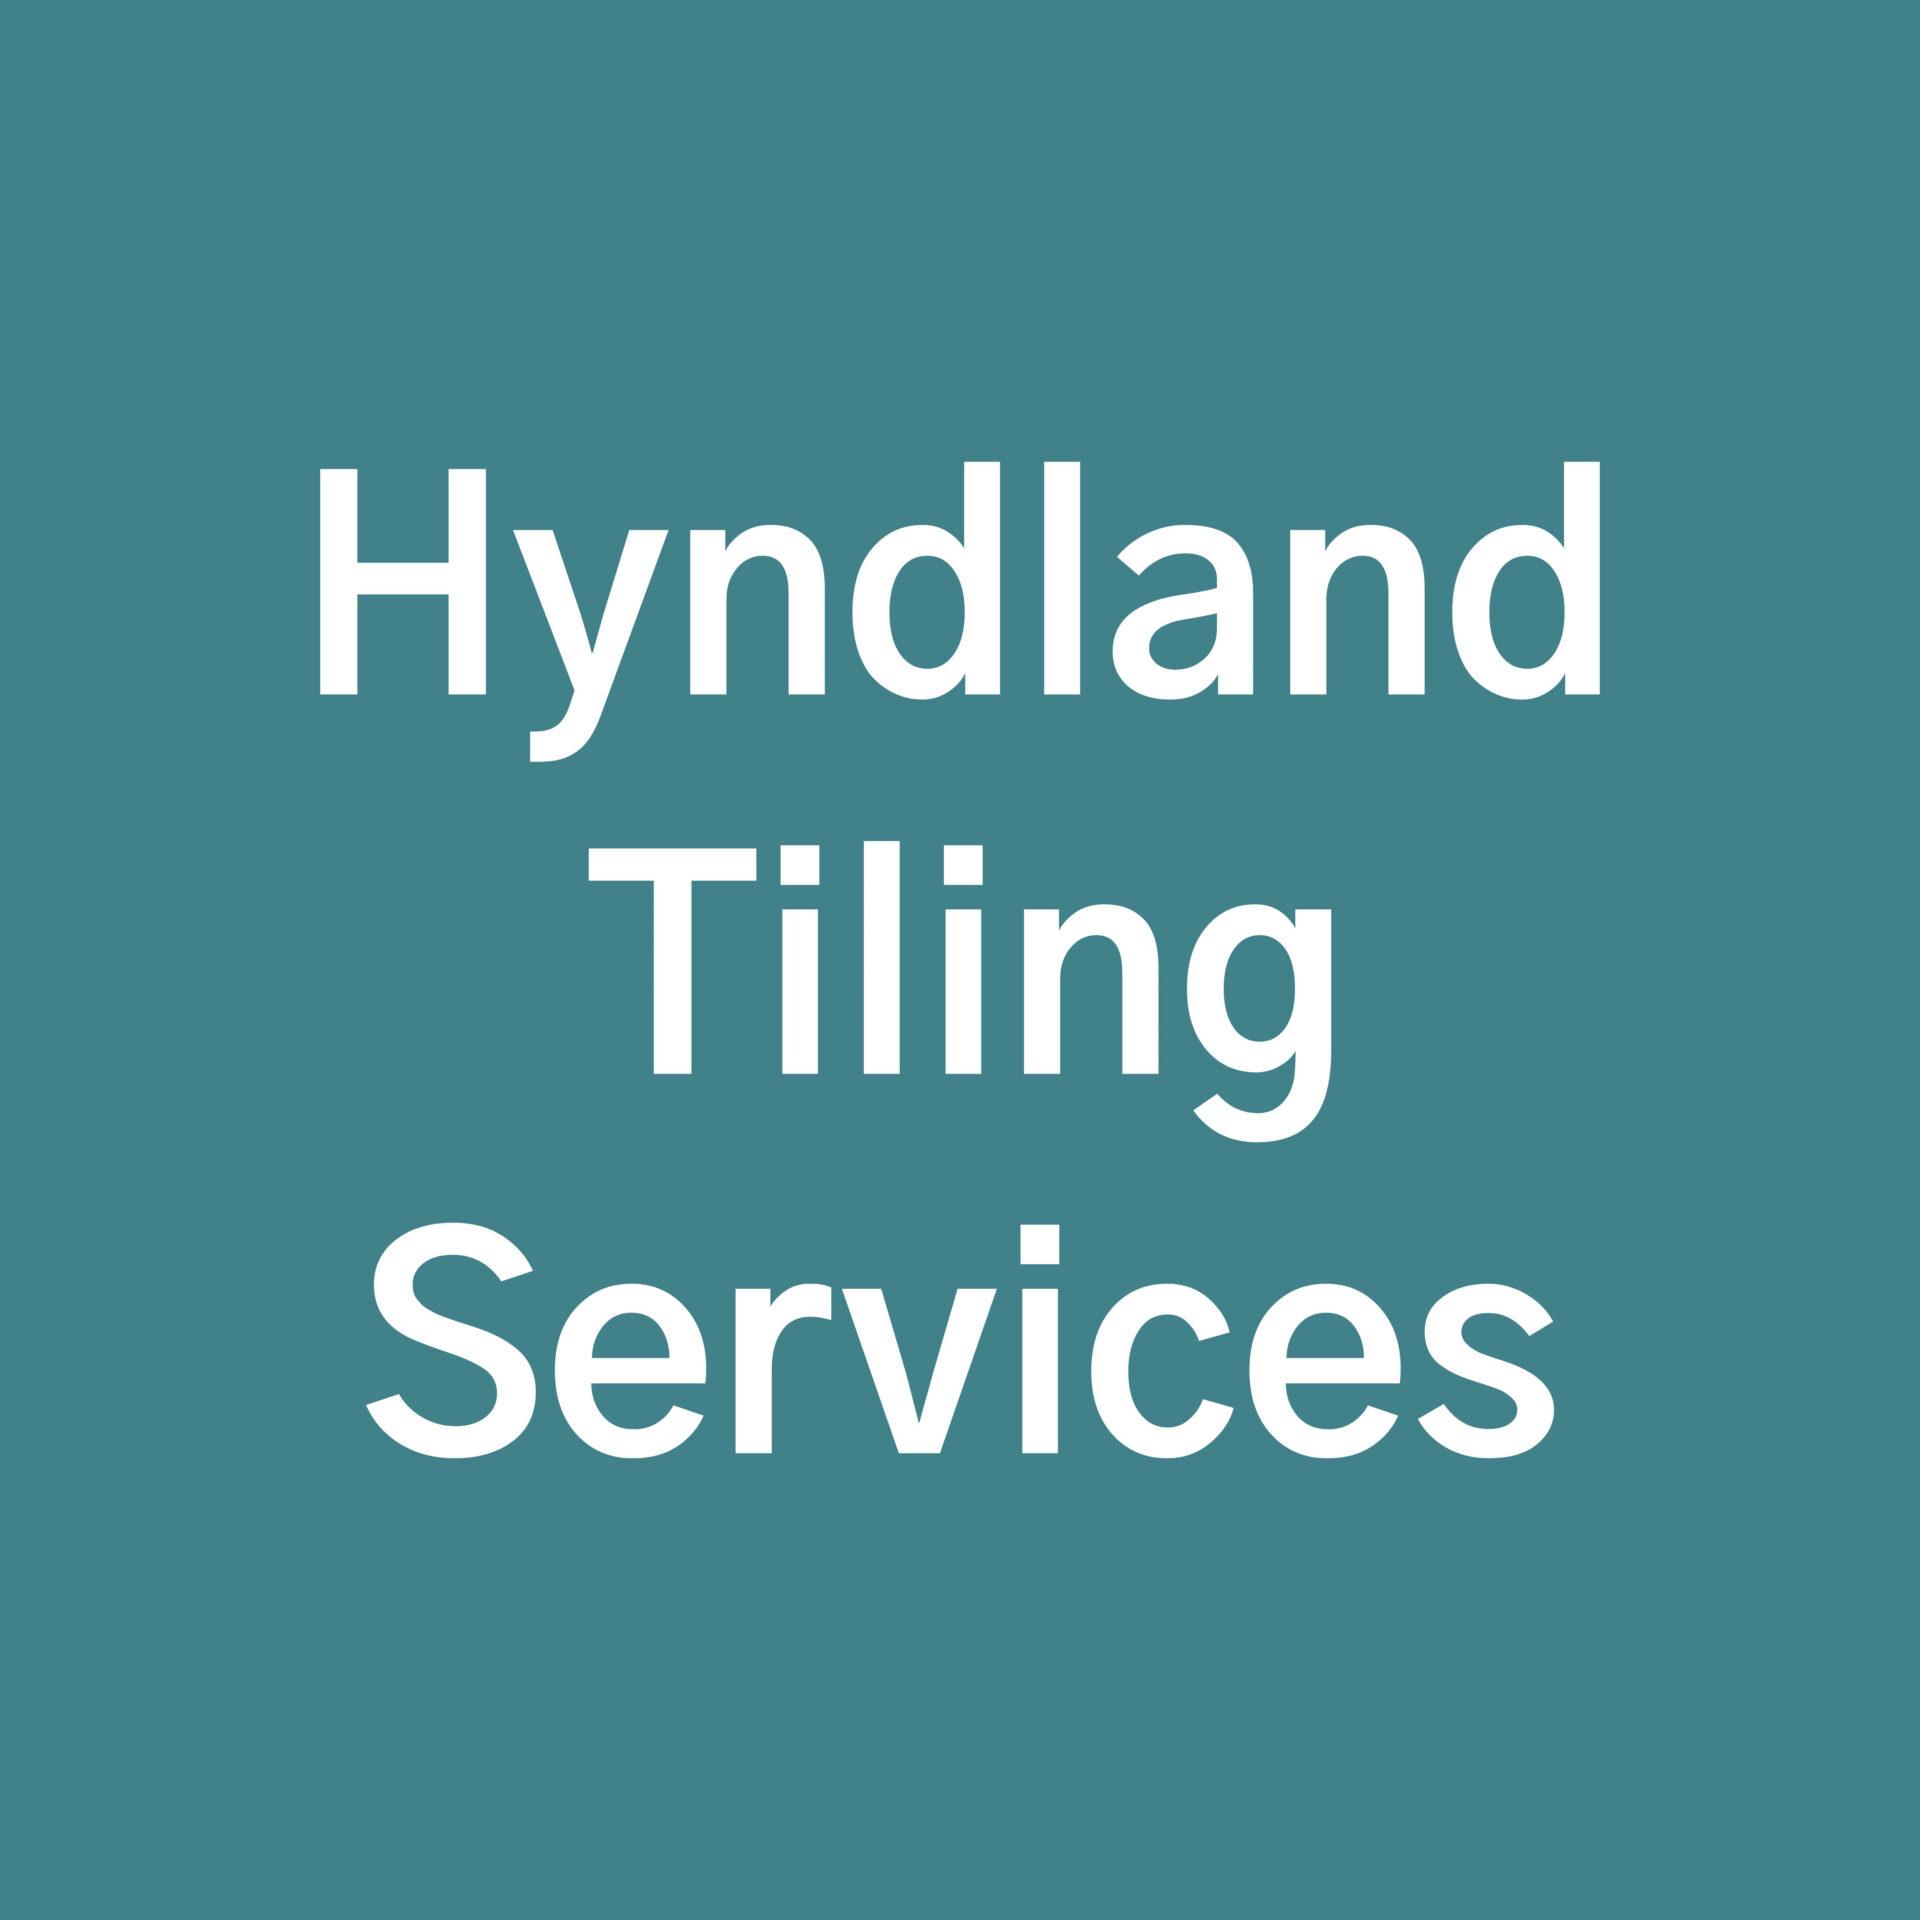 Hyndland Tiling Services